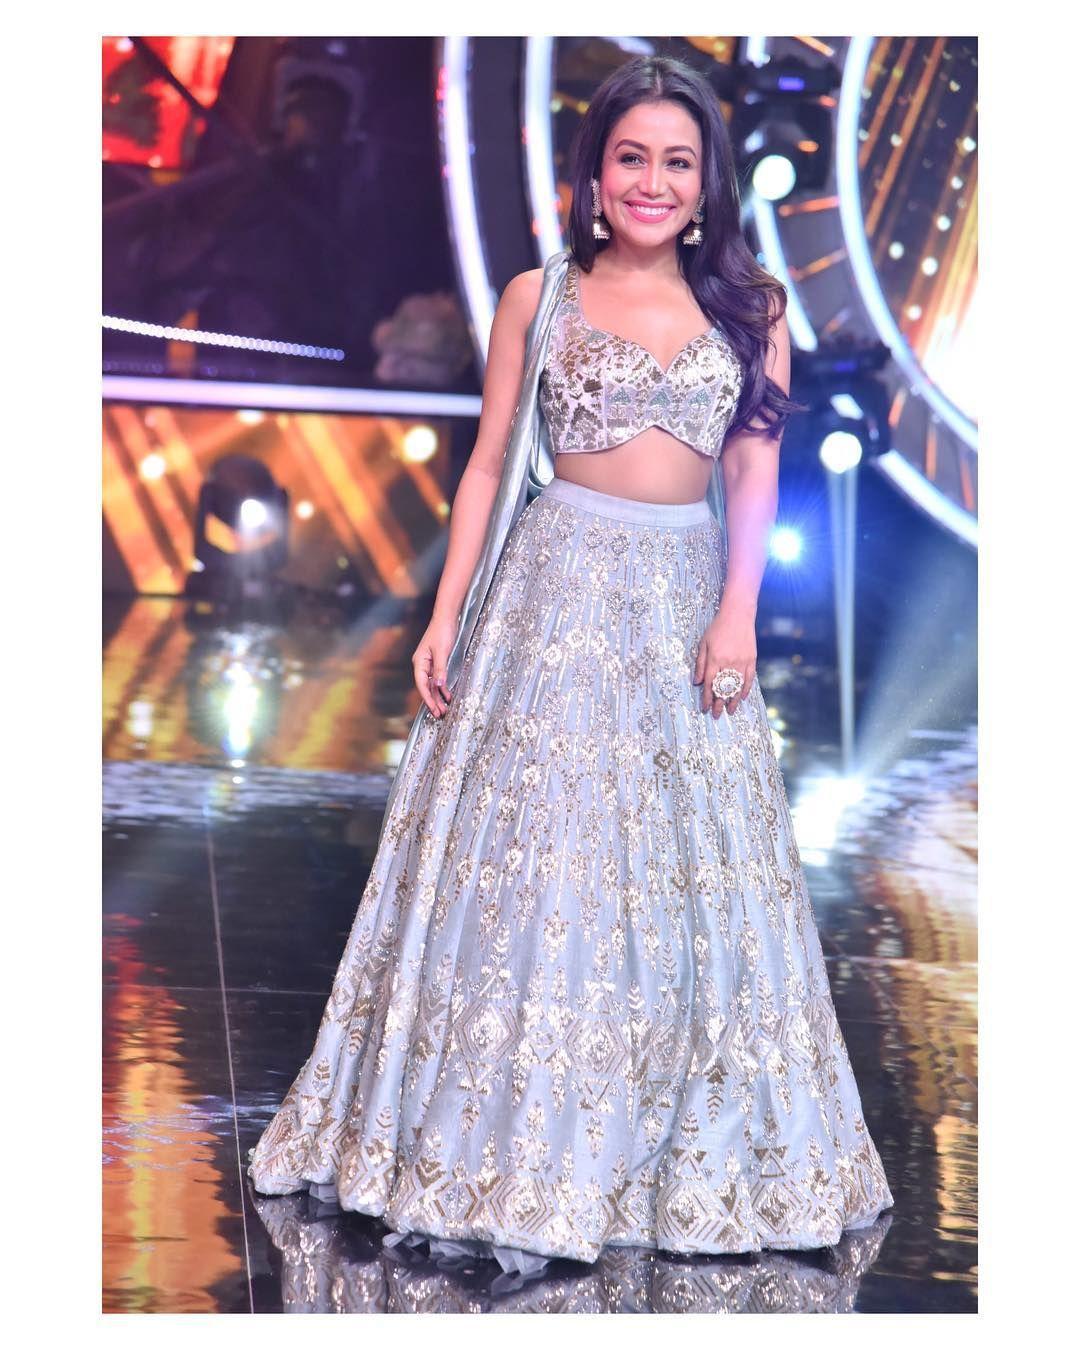 One Of My Most Favourite Looks From Indianidol Styled By Styledose1 Outfit By Kalkifashion Instagladuca Neha Kakkar Dresses Raw Silk Lehenga Lehenga